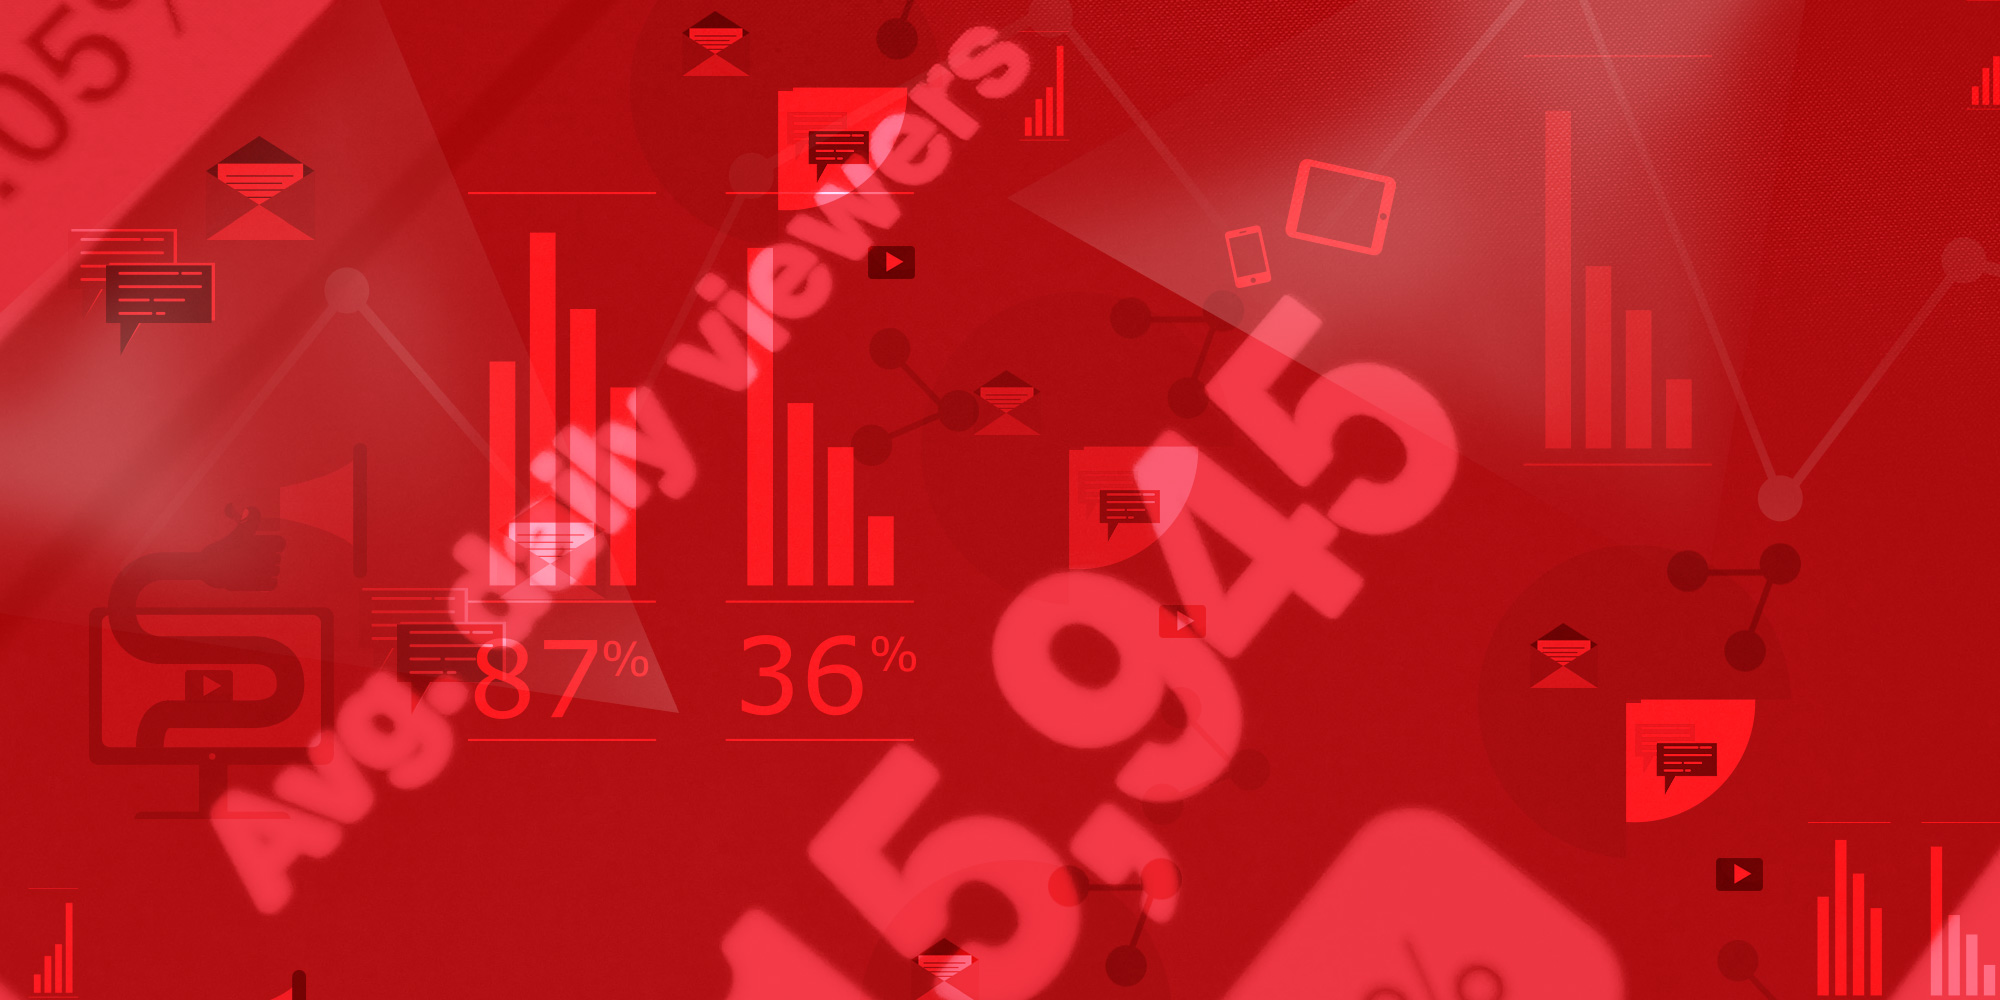 Data Driven Marketing implementation tips